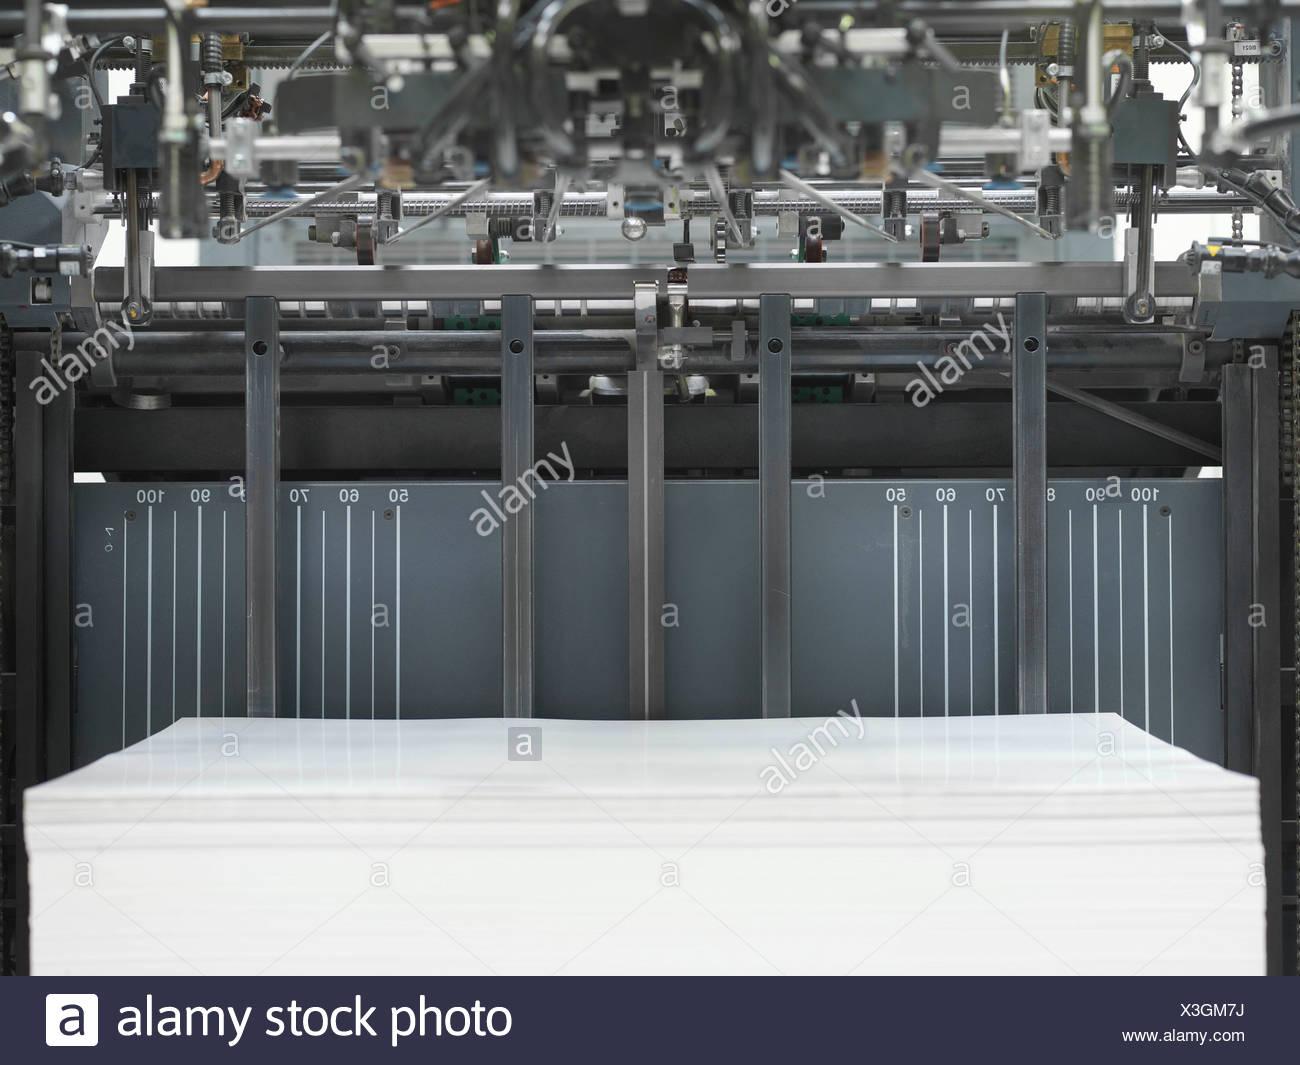 Paper In Printer Stock Image Printer